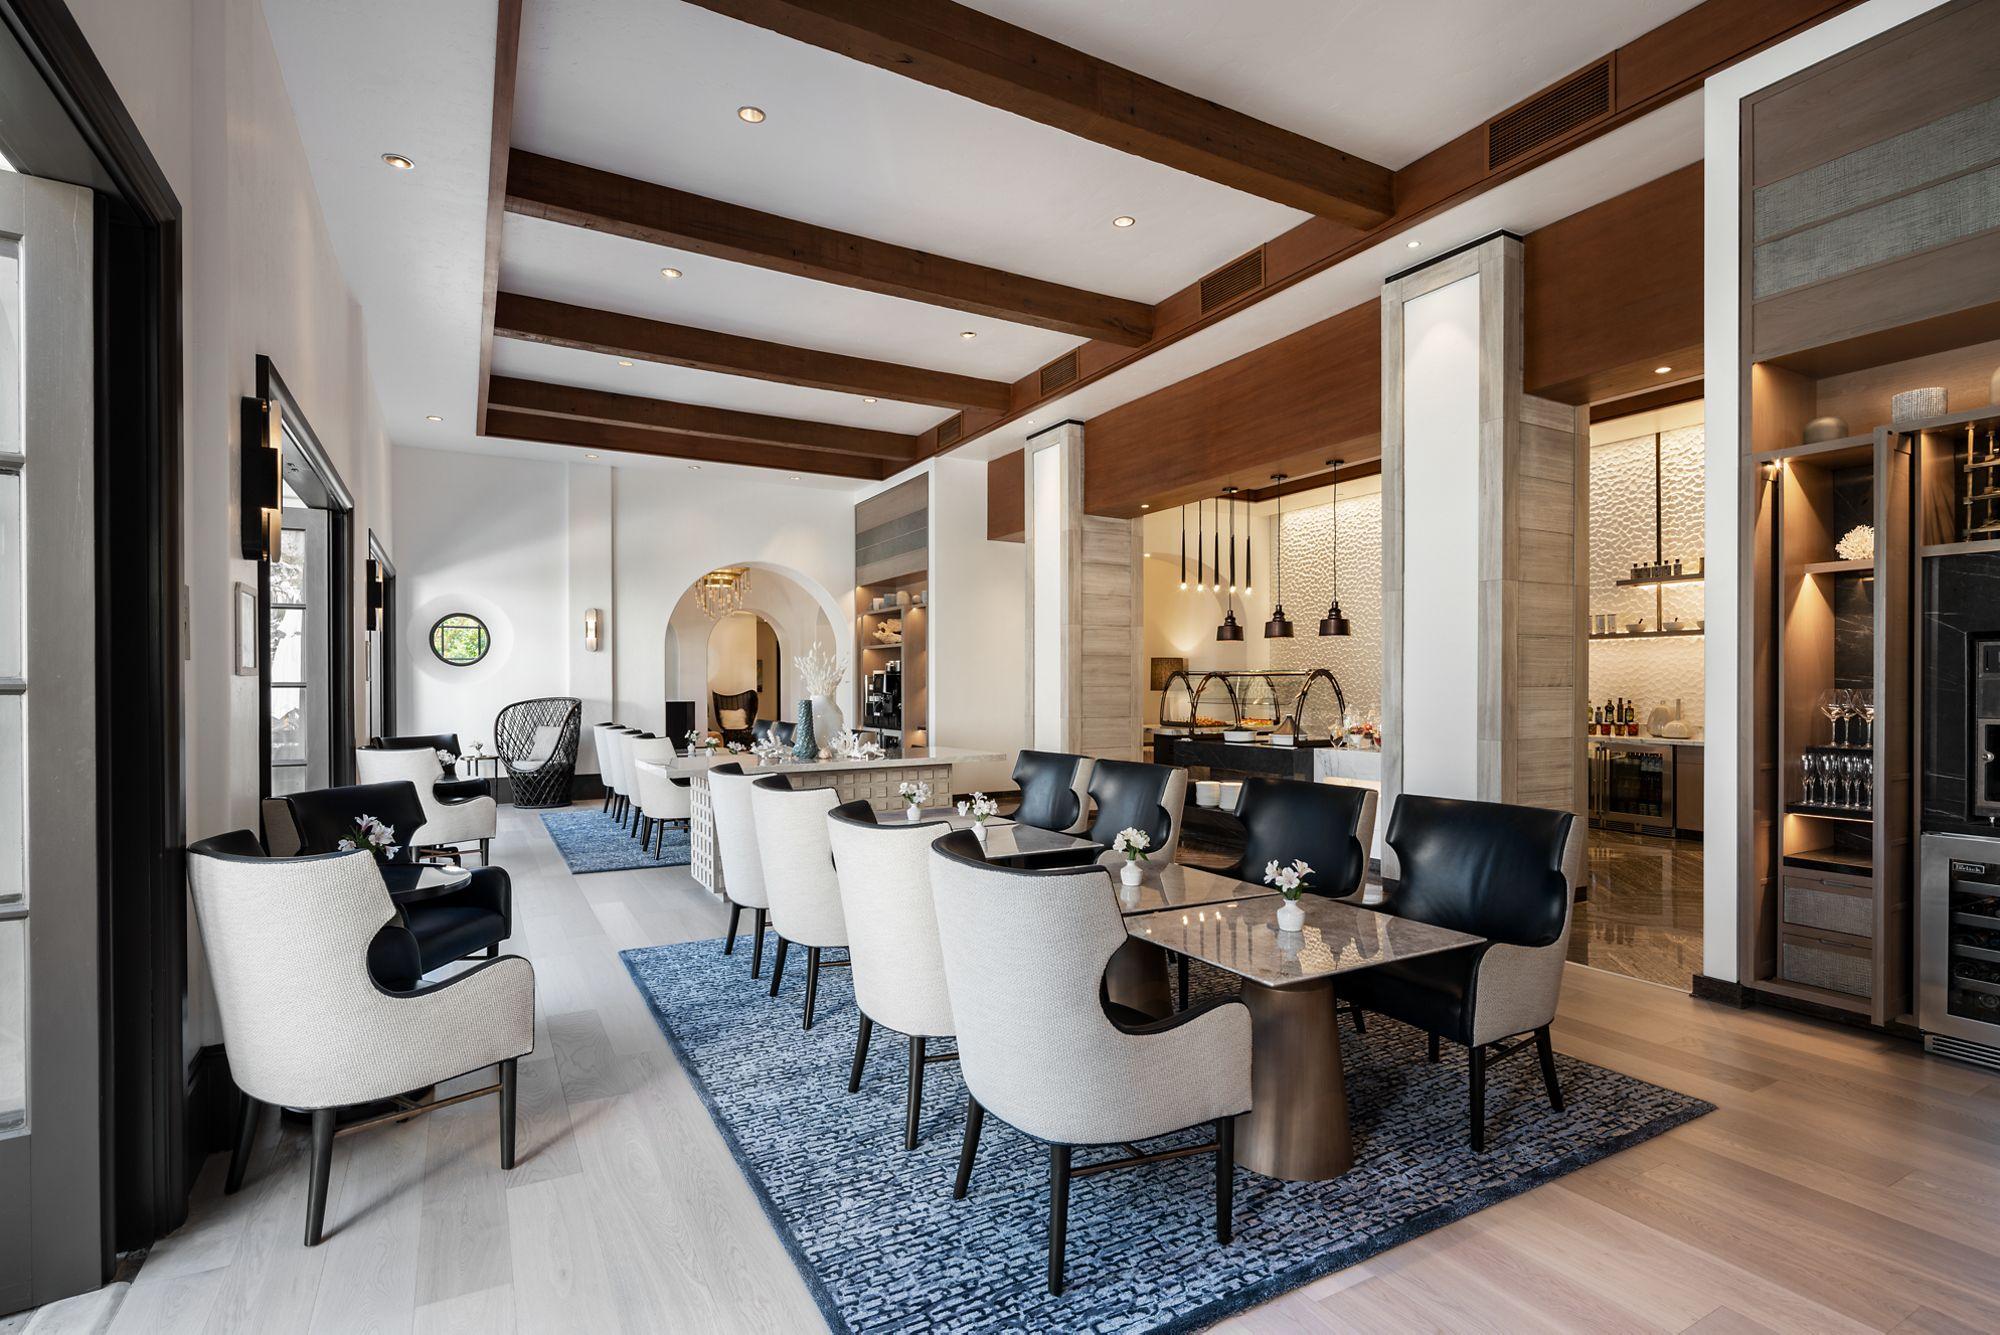 A New Club Lounge Elevates The Ritz-Carlton Bacara, Santa Barbara Experience